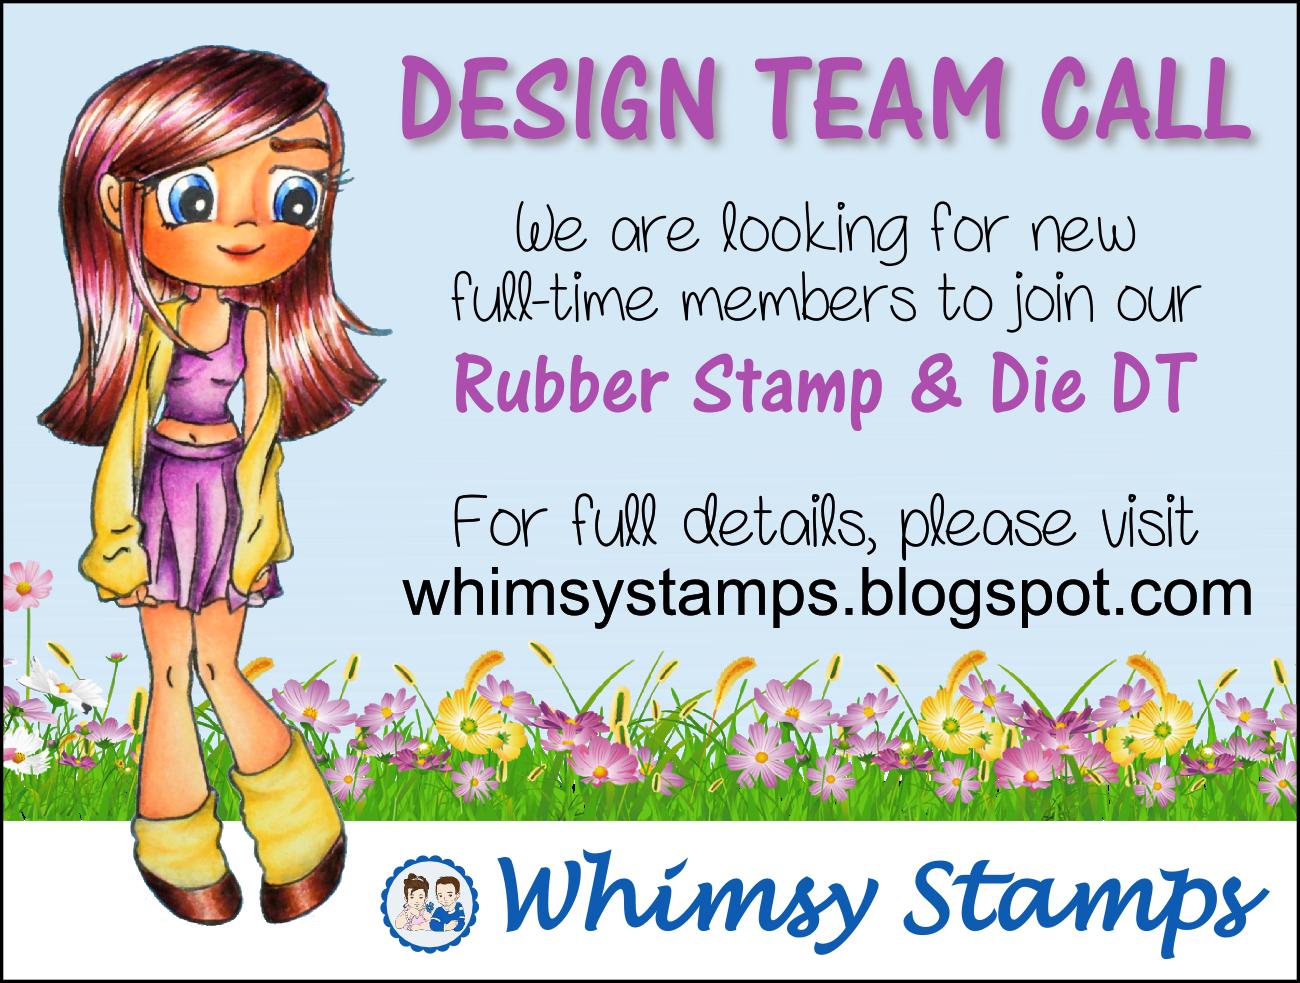 http://whimsystamps.blogspot.co.uk/2014/10/design-team-call.html